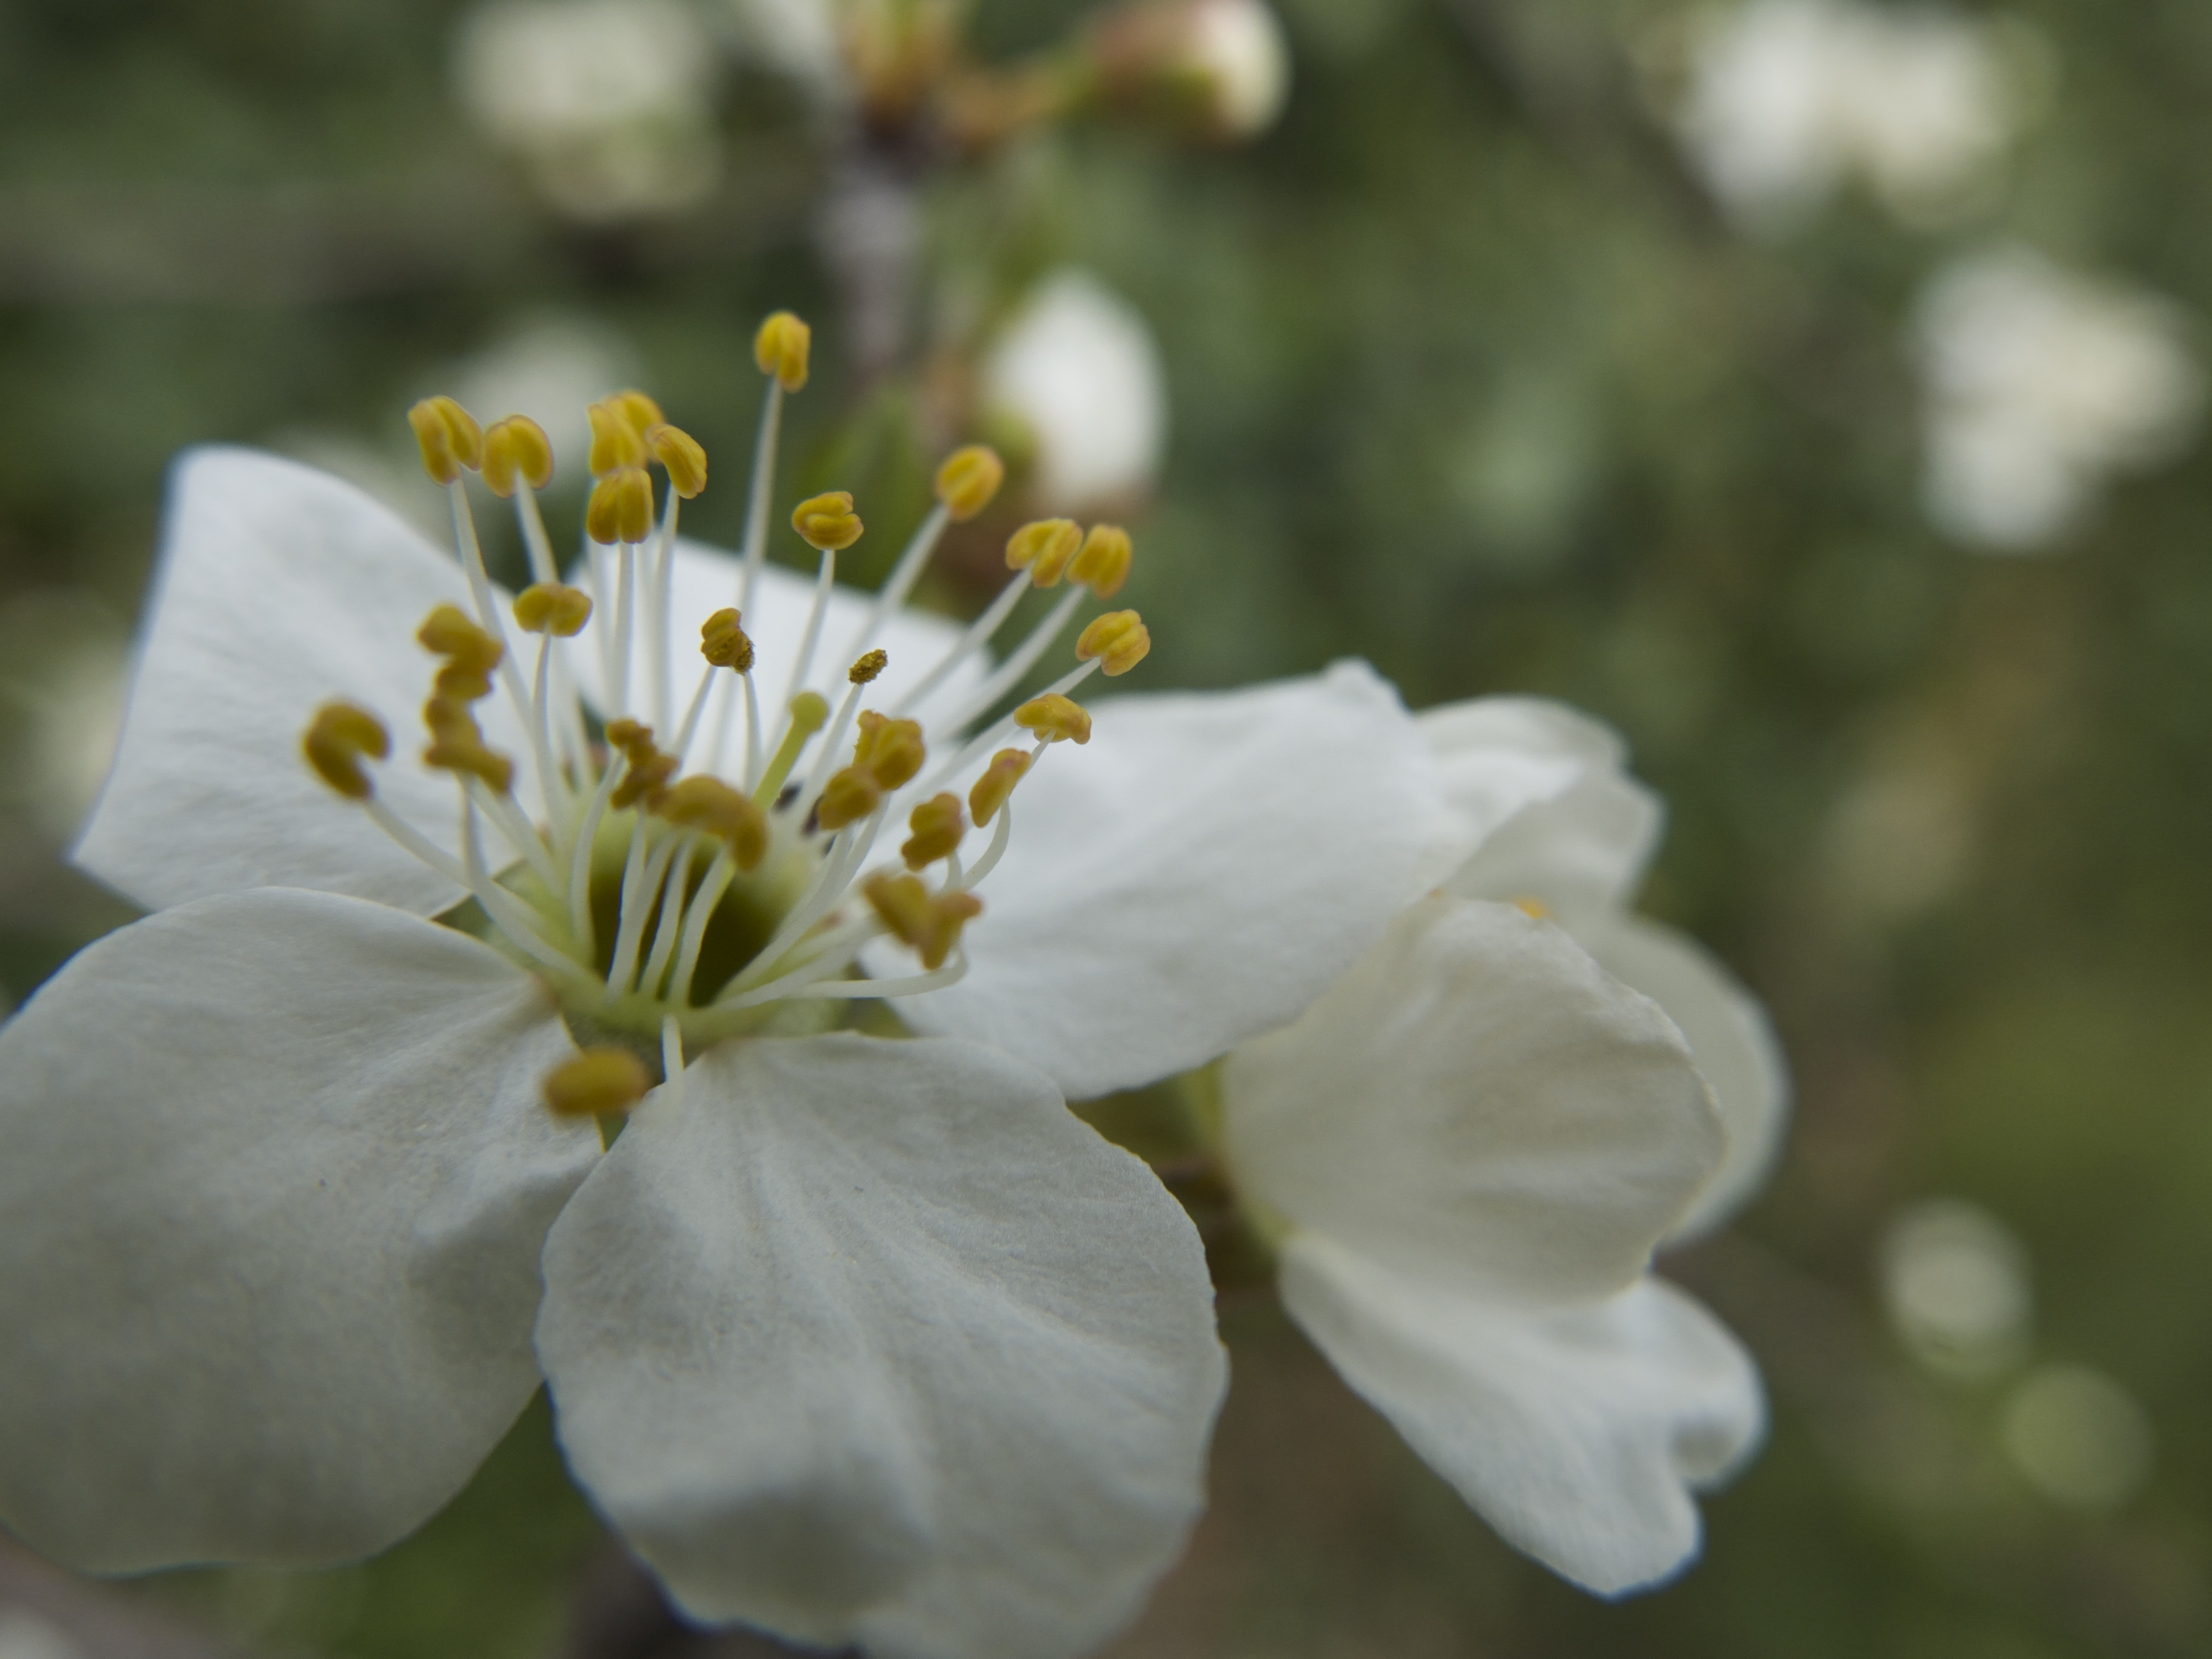 Une fleur de prunier